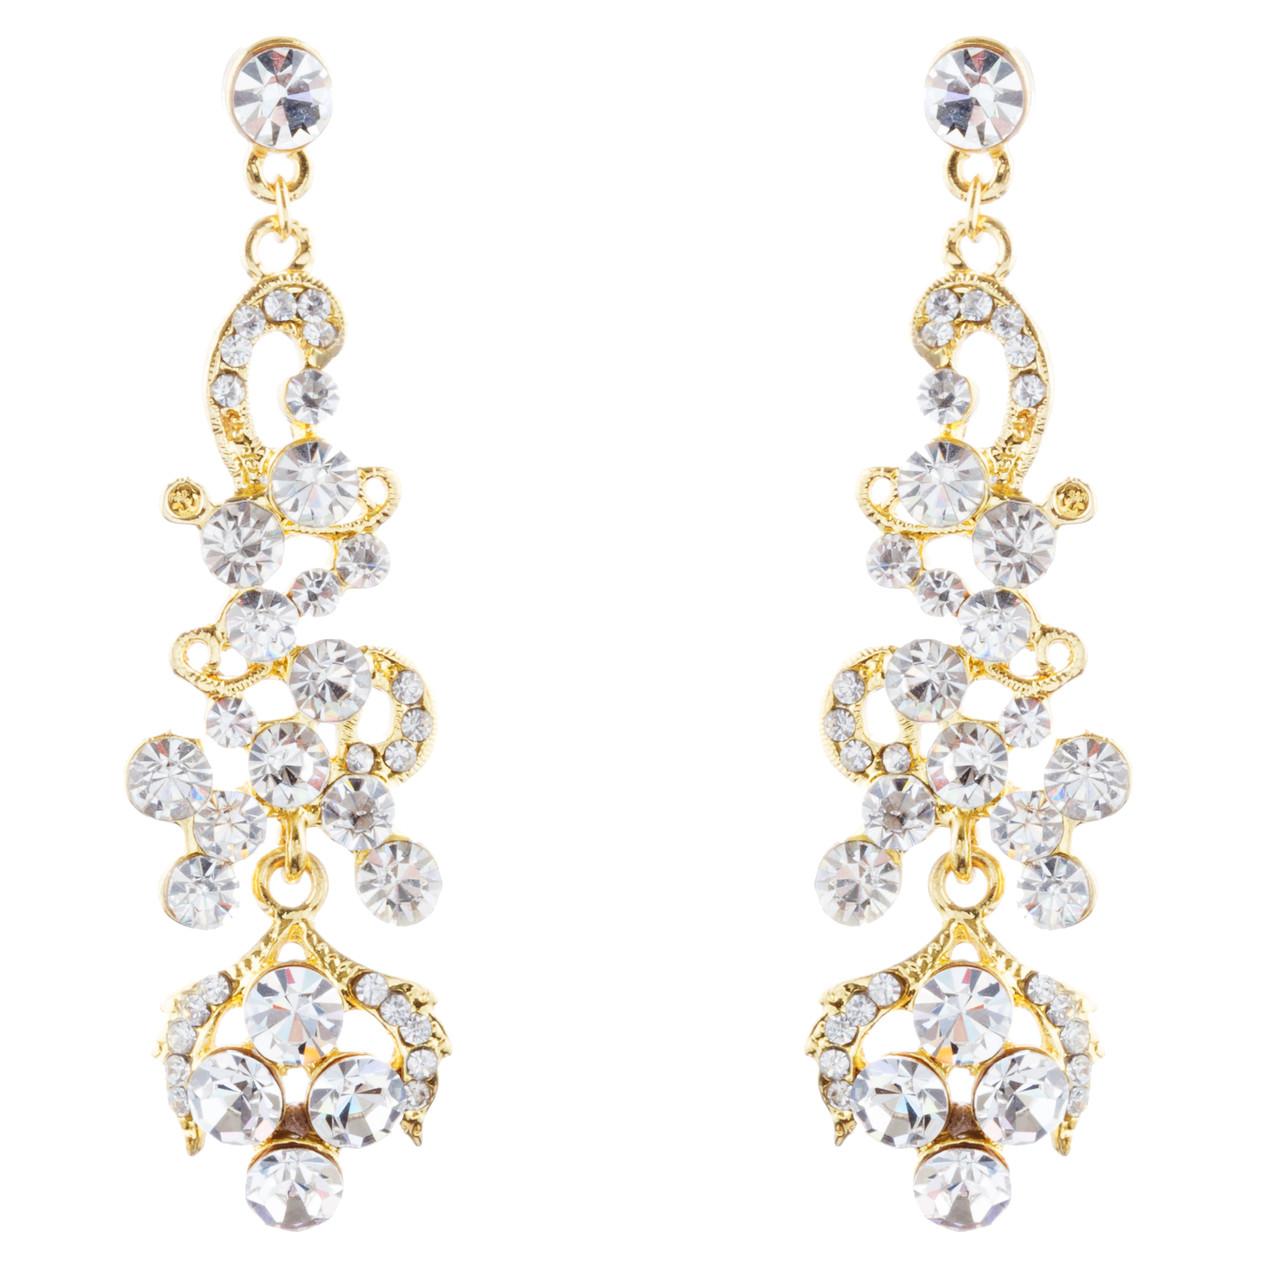 2859d5a8aa865 Bridal Wedding Jewelry Prom Classy Crystal Rhinestone Dangle Earrings E968  Gold